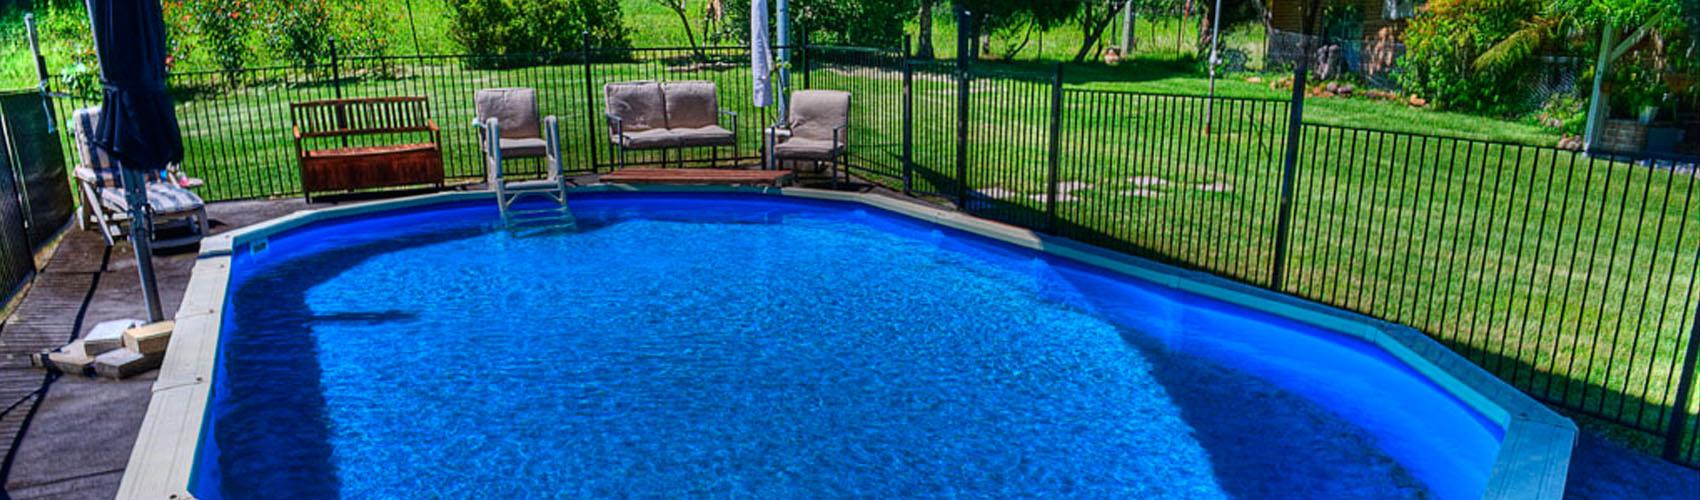 Above Ground Pool Sales